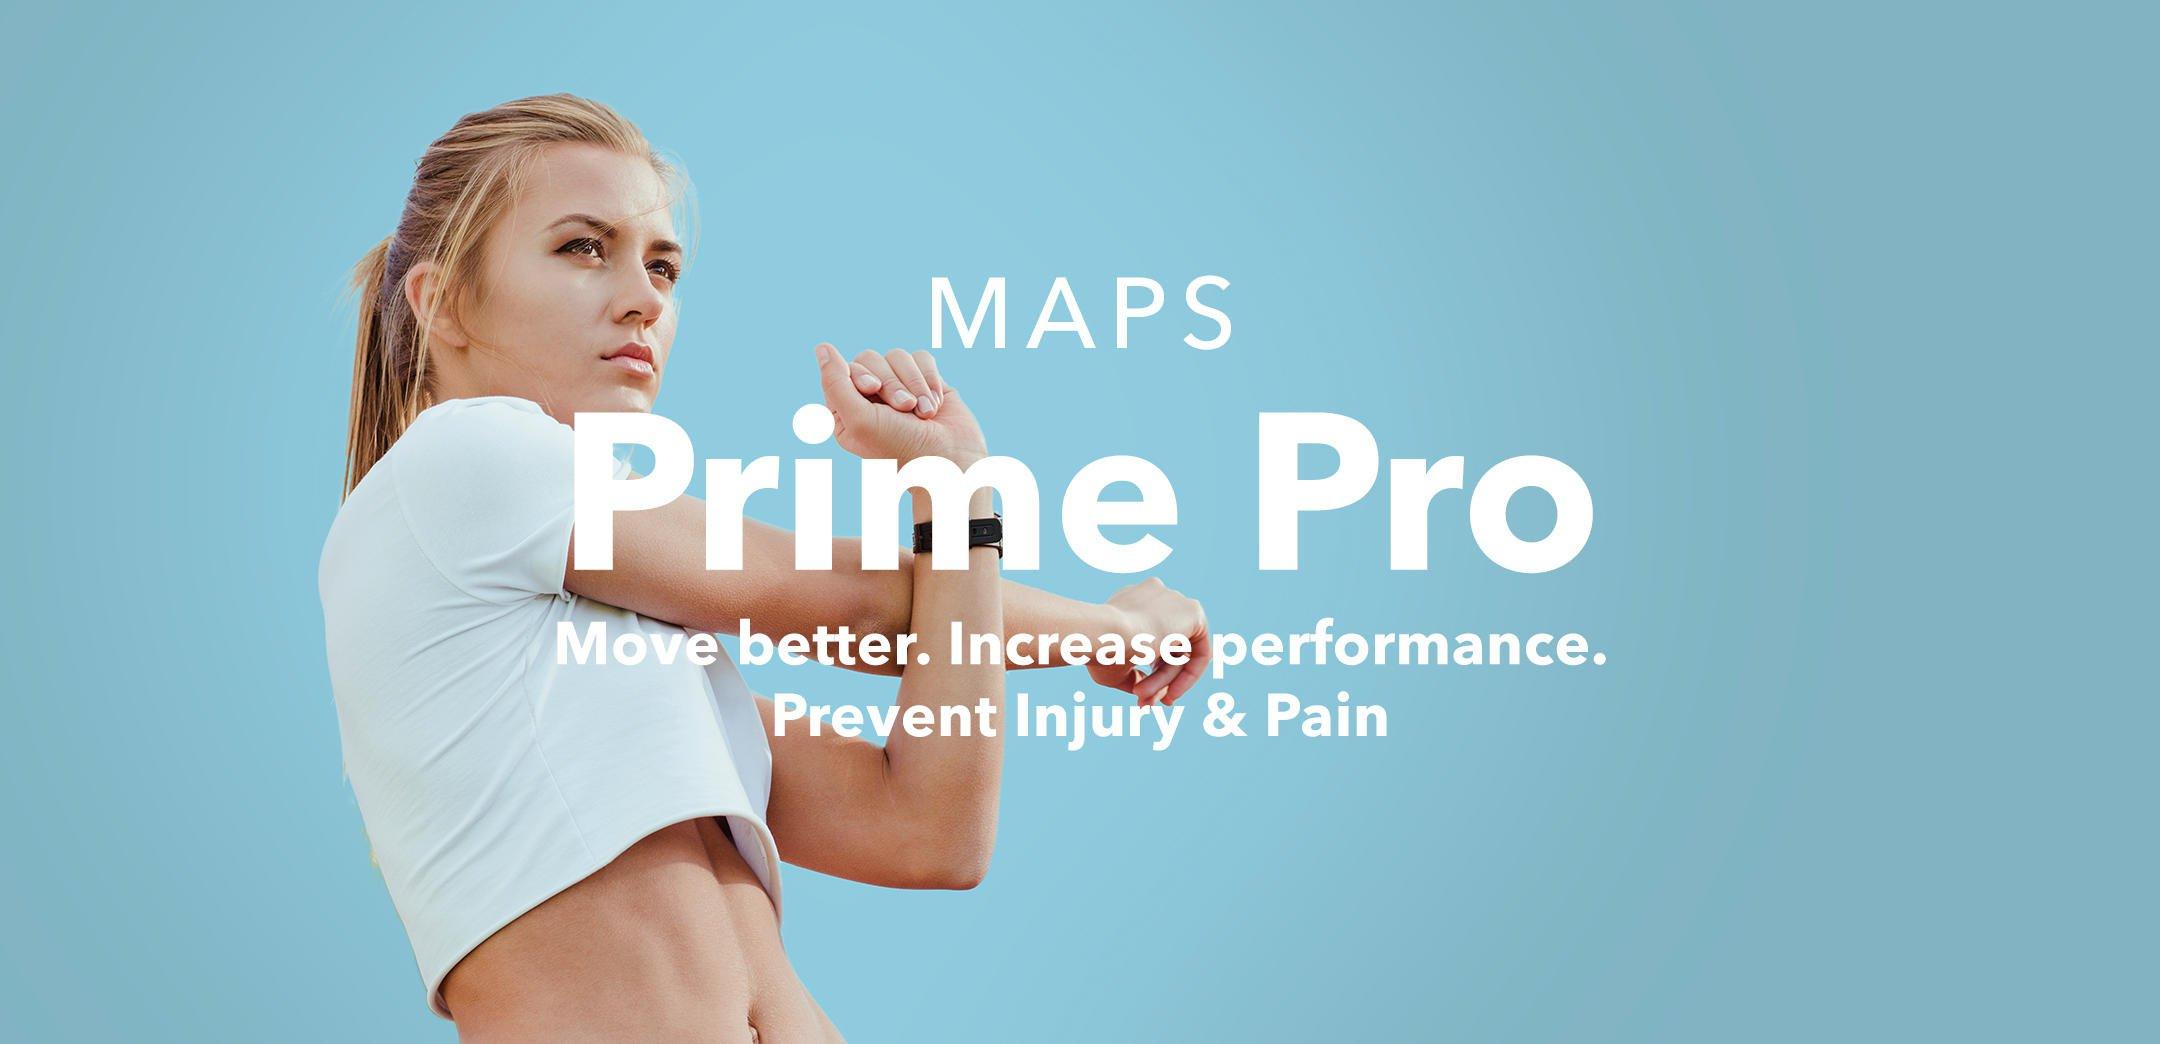 Prime Pro Image